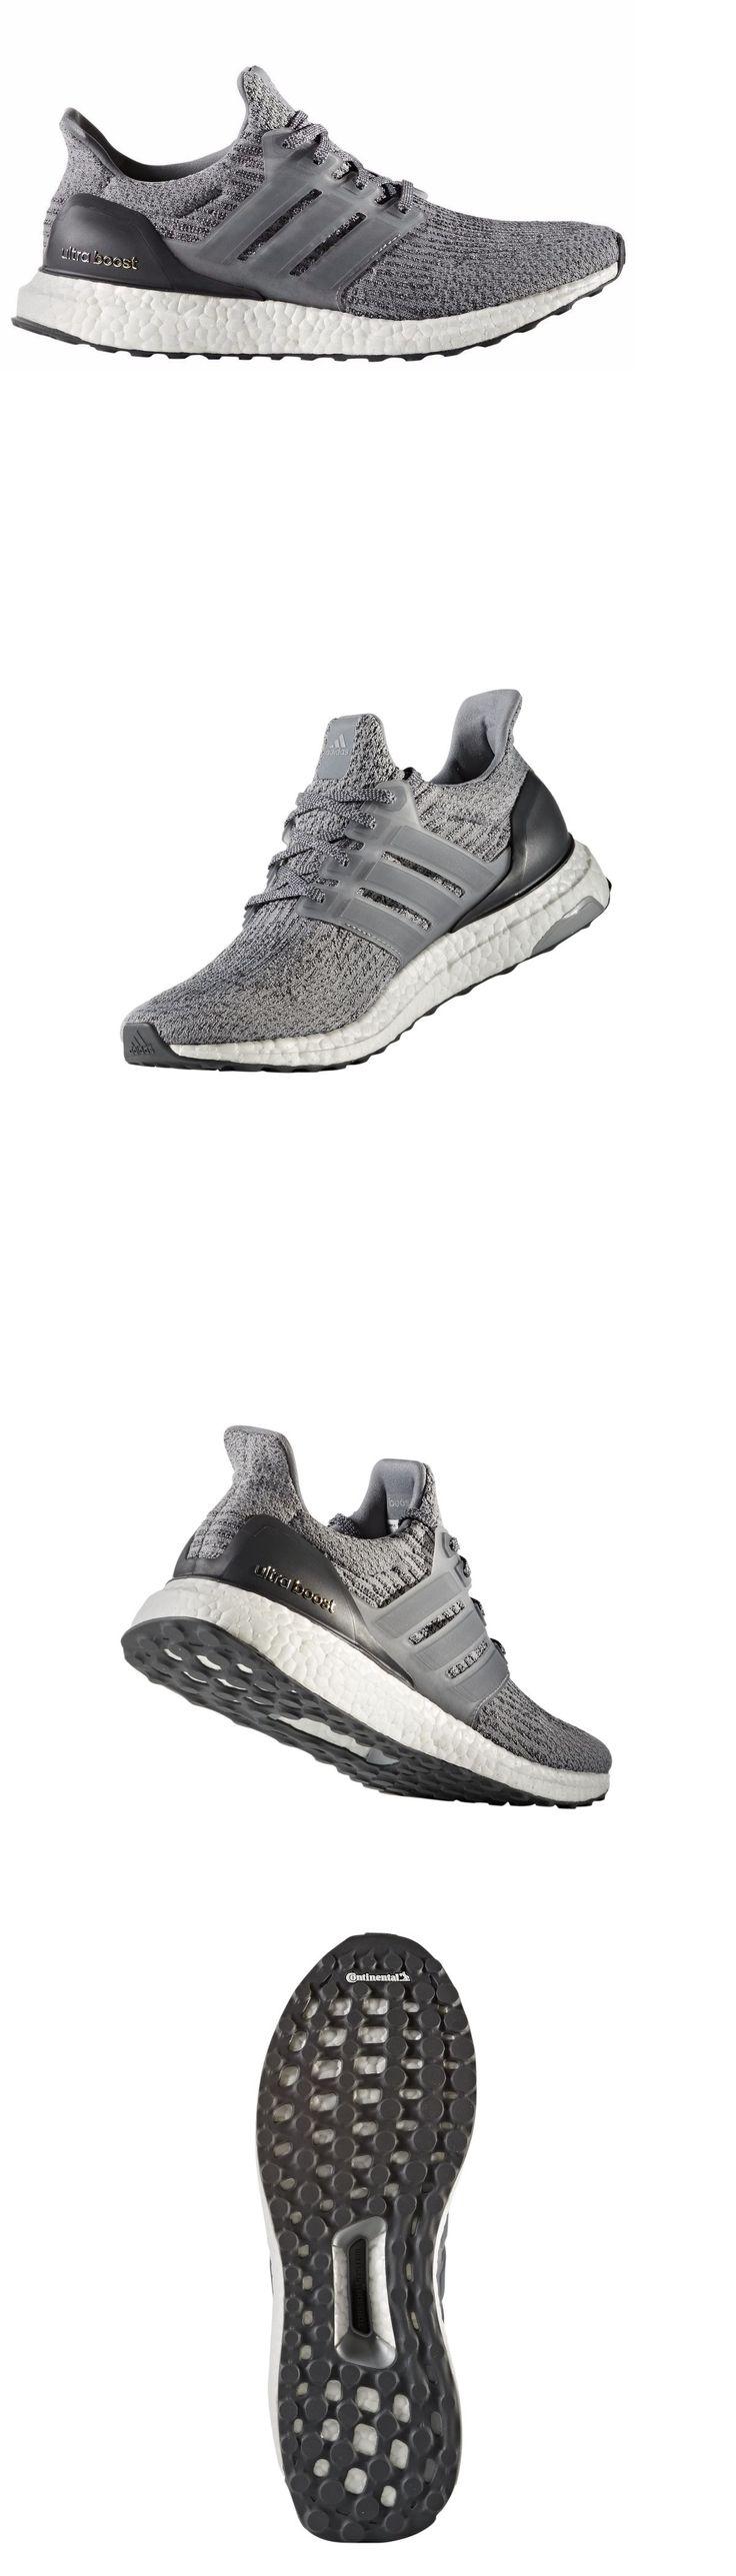 Men Shoes: New Men S Adidas Ultra Boost 3.0 - Ba8849 Mystery Grey Ultraboost Sneakers -> BUY IT NOW ONLY: $199.99 on eBay!